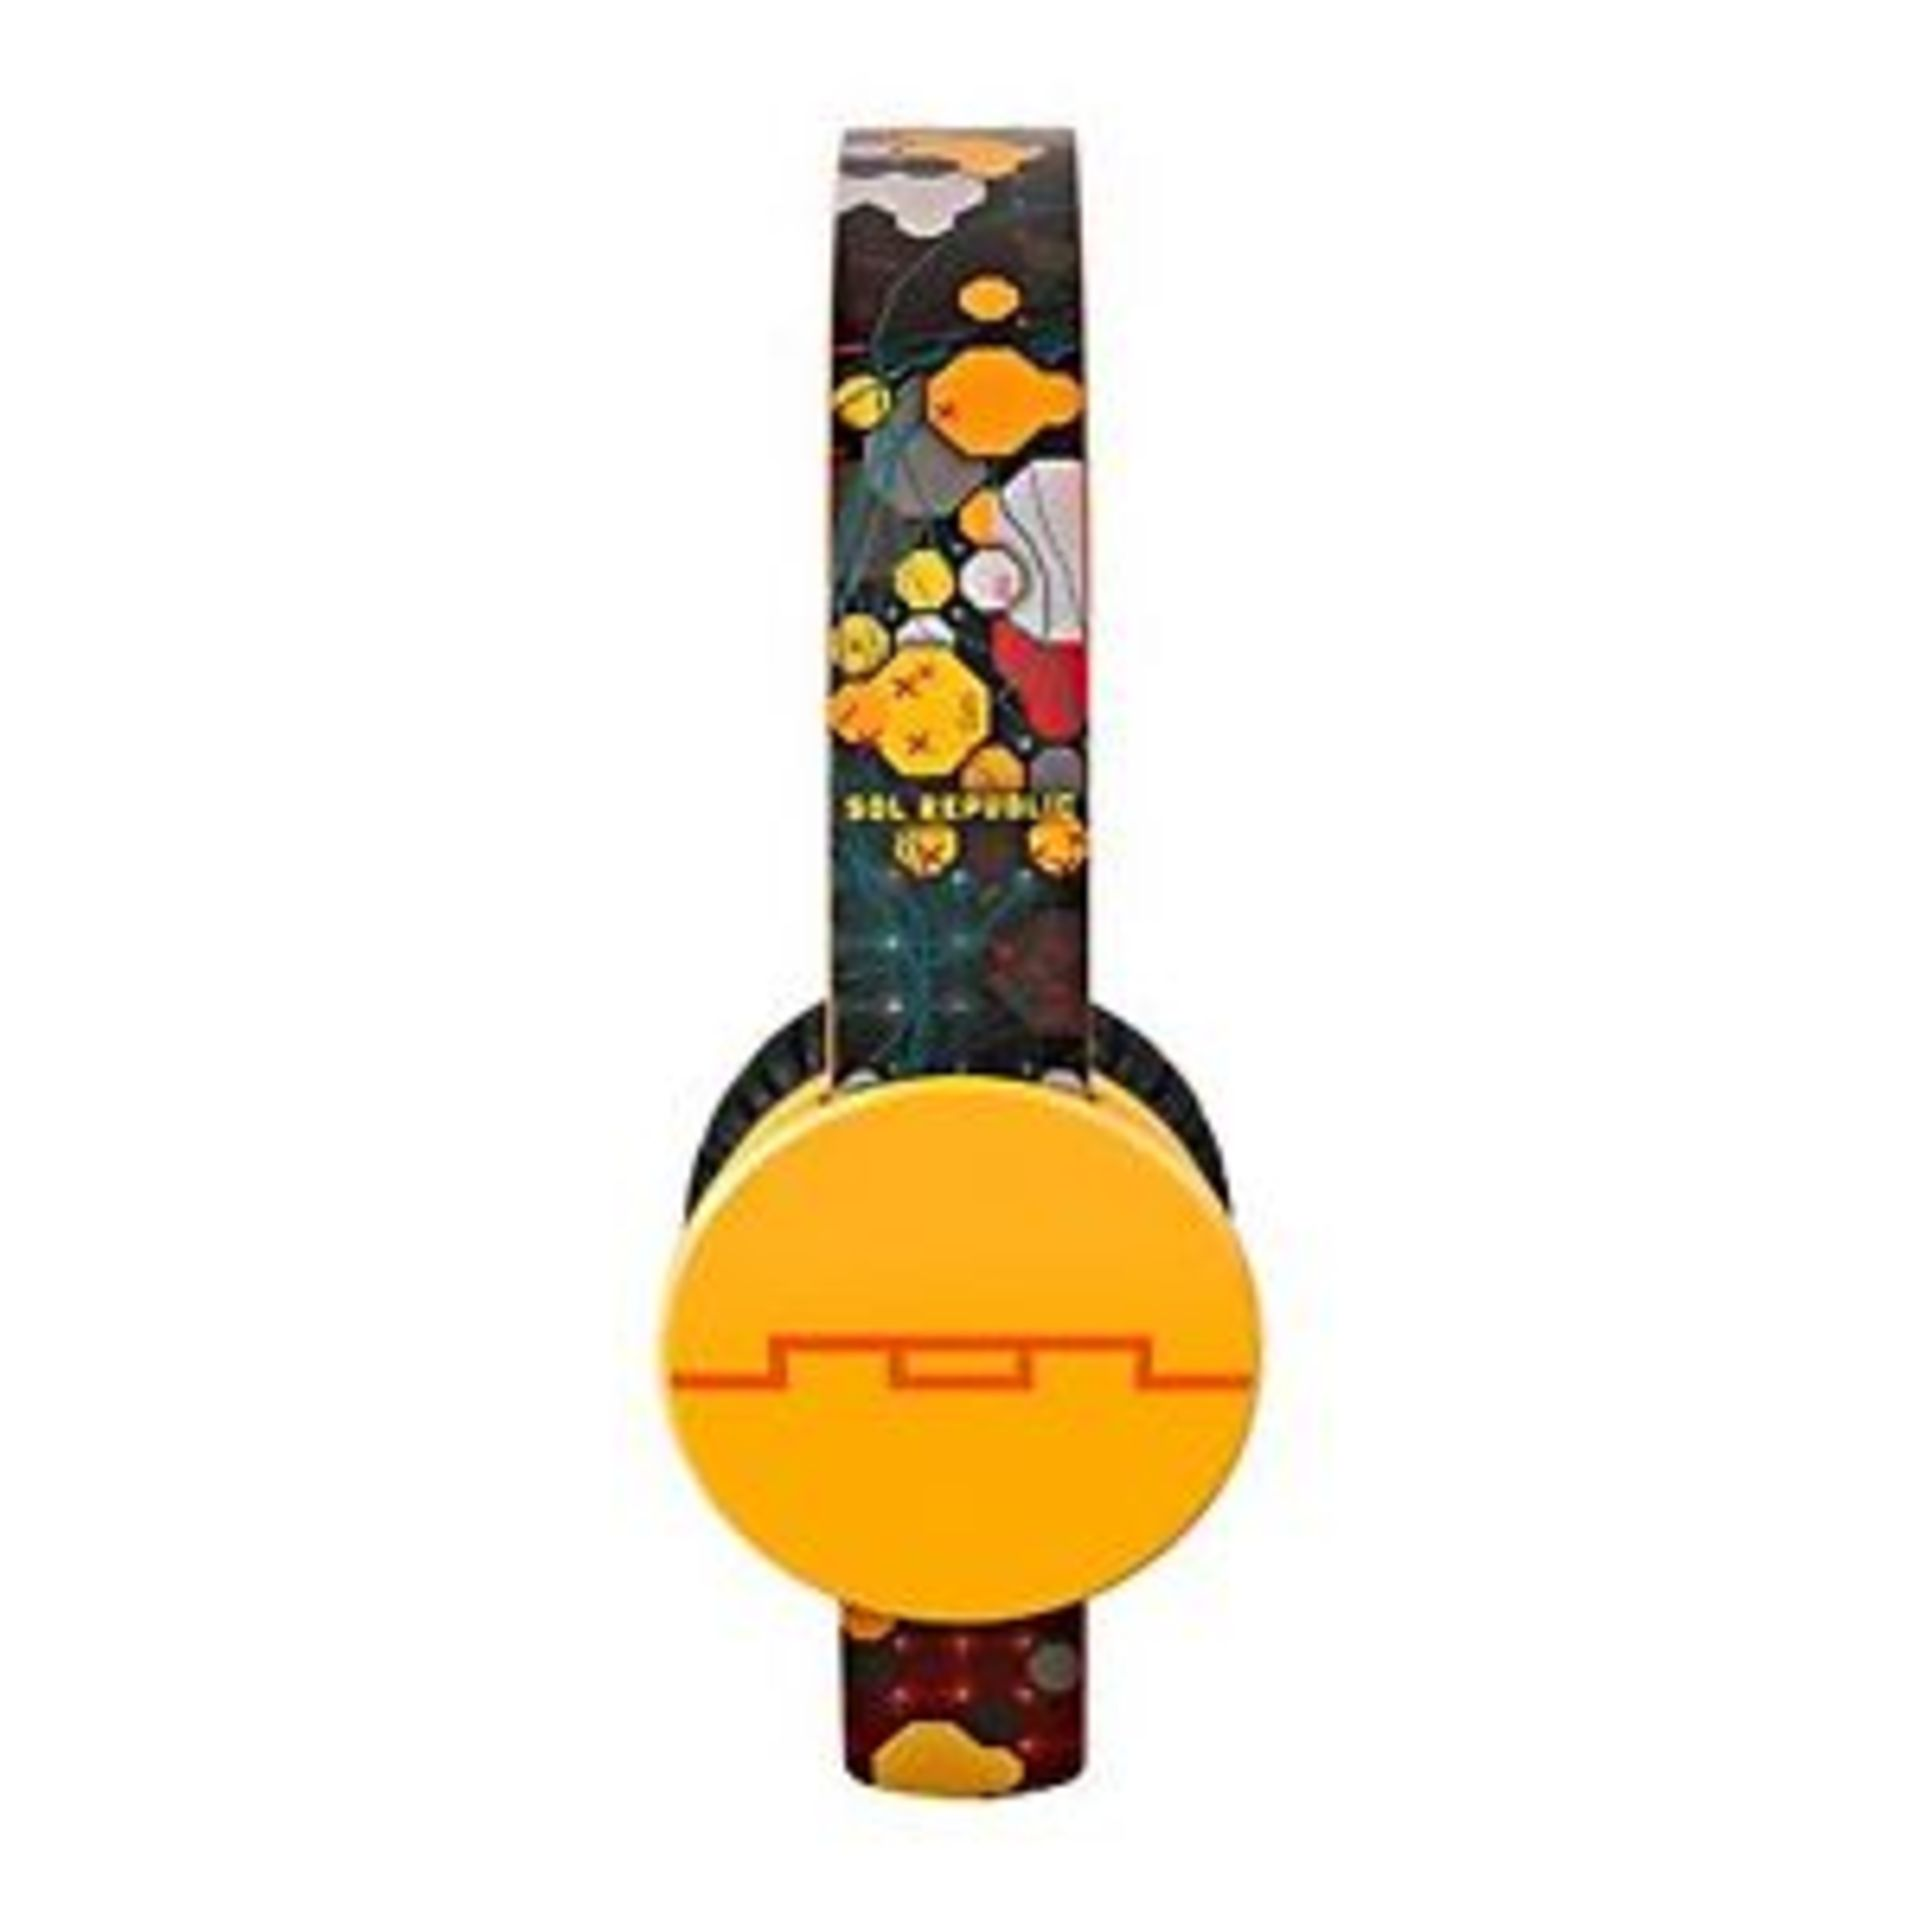 + VAT Brand New Sol Republic Tracks V8 Multicoloured - With Sonic Ear Cushions - Music & Phone